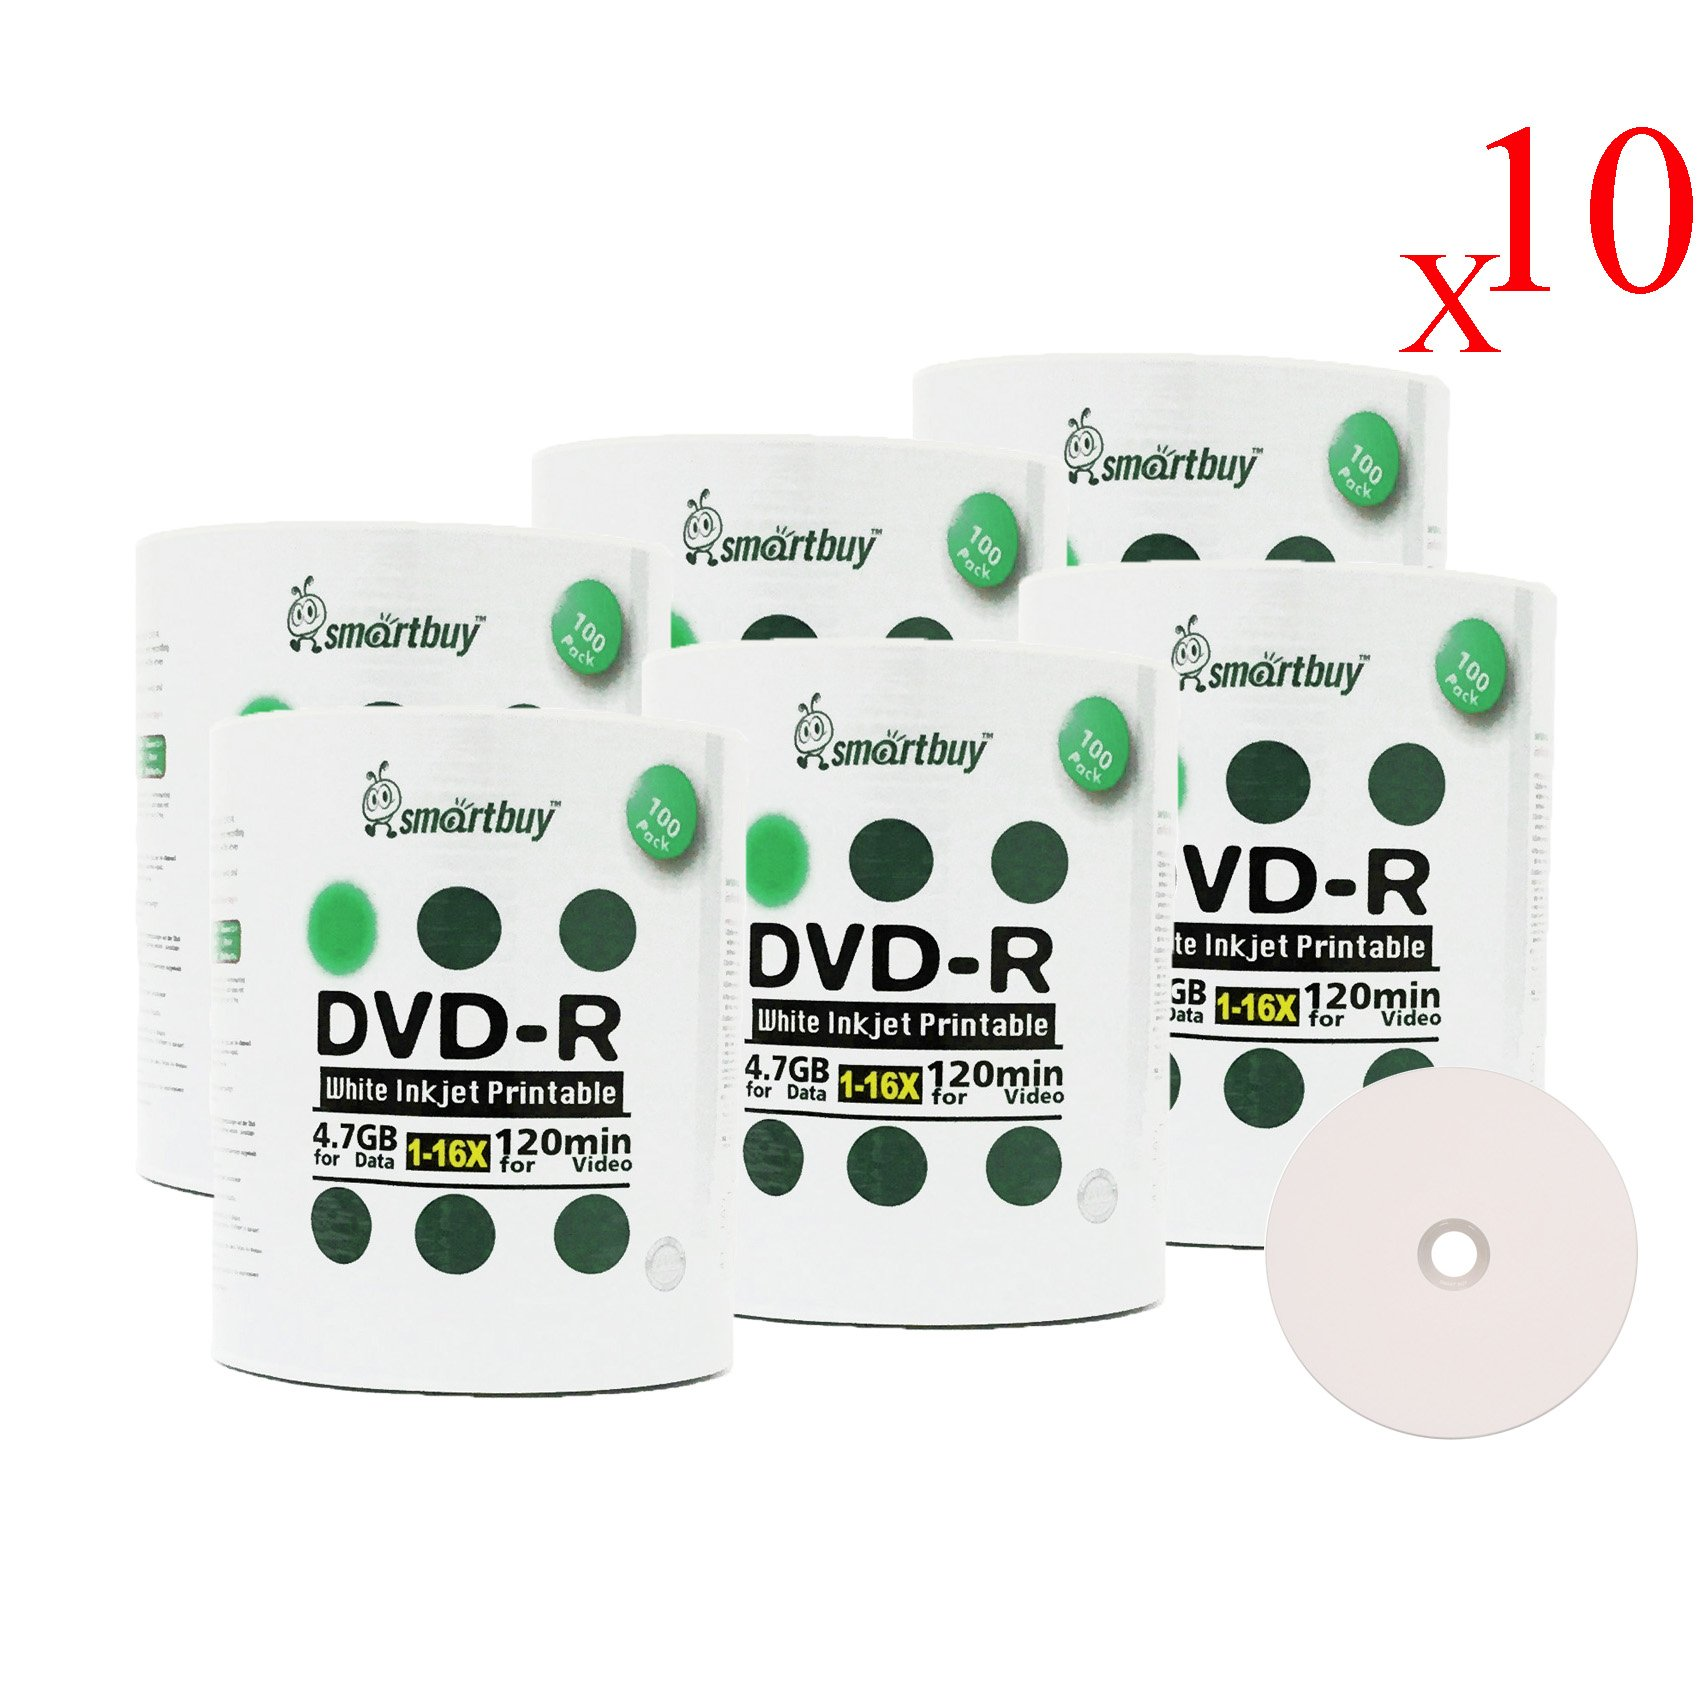 Smartbuy 6000-disc 4.7gb/120min 16x DVD-R White Inkjet Hub Printable Blank Data Recordable Media Disc